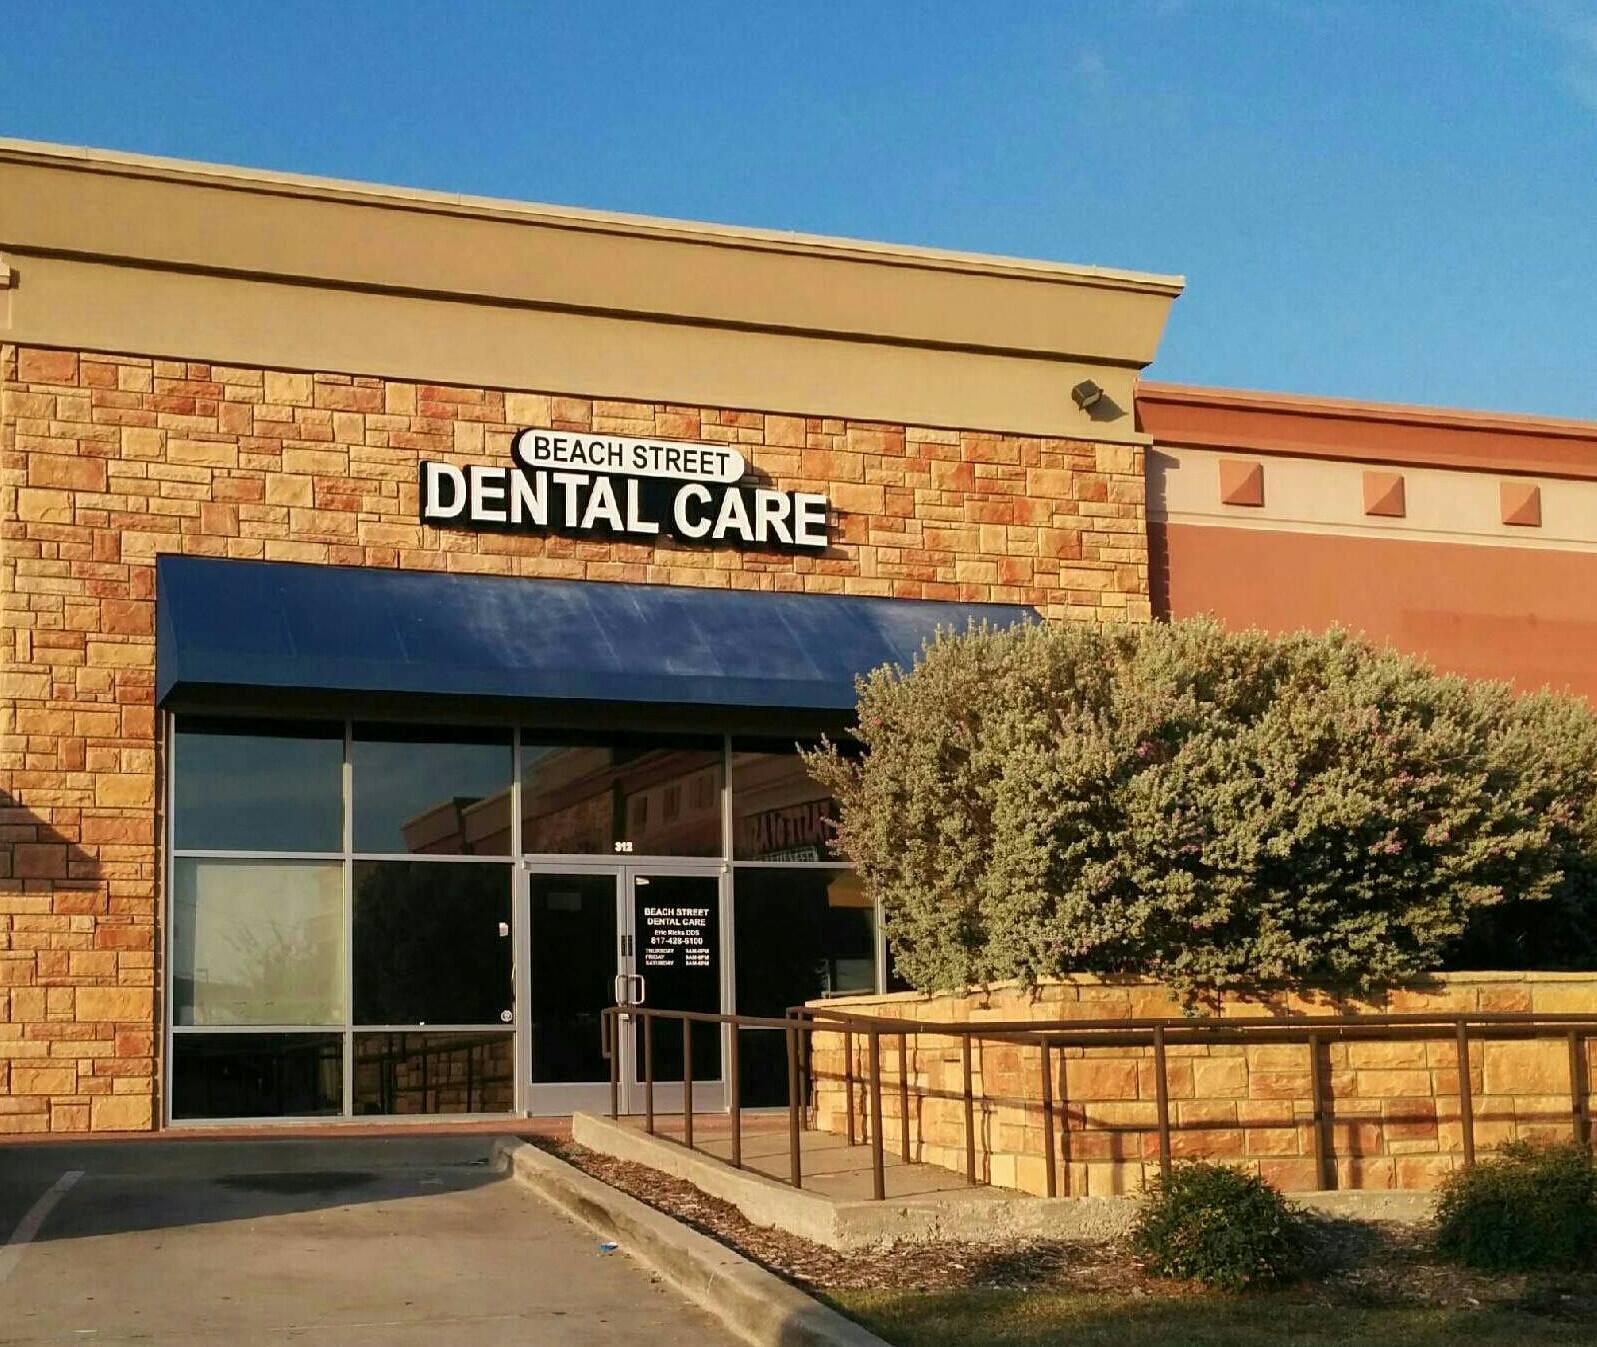 Beach Street Dental Care